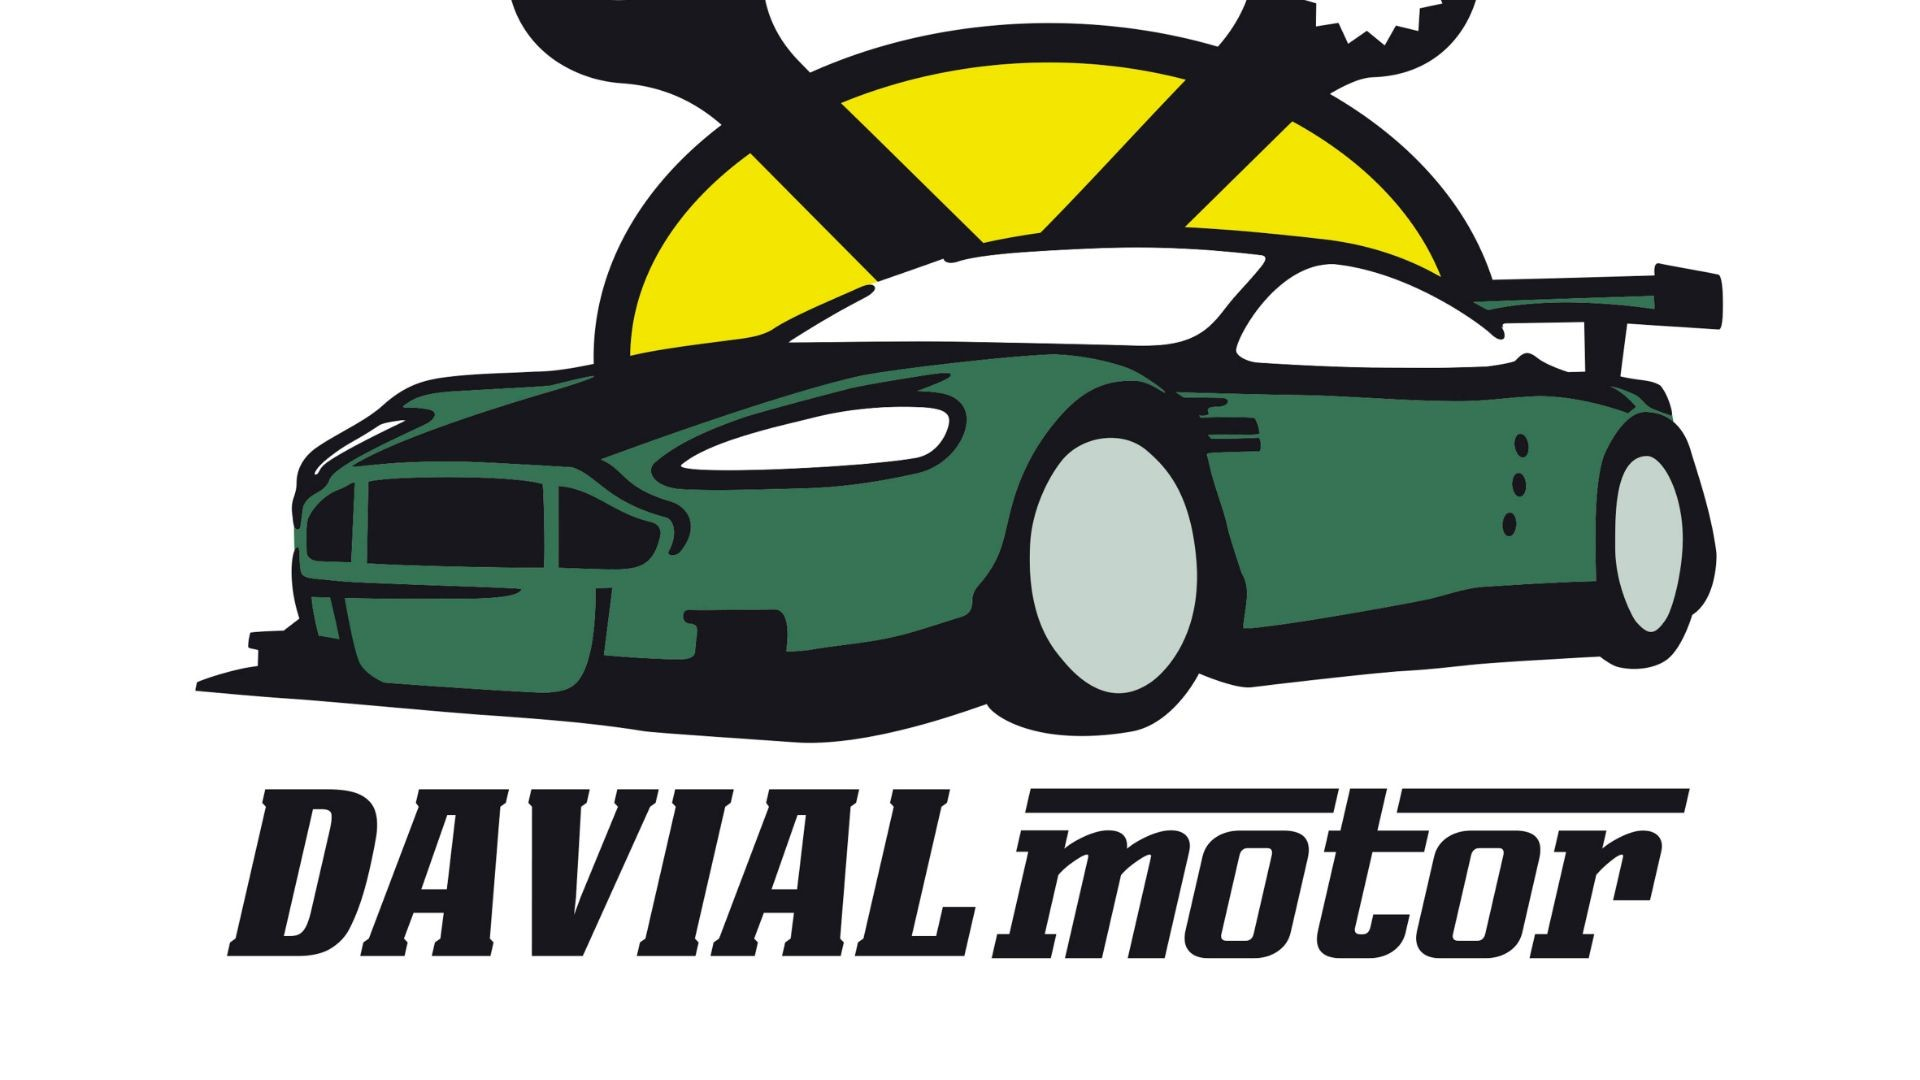 DAVIAL MOTOR